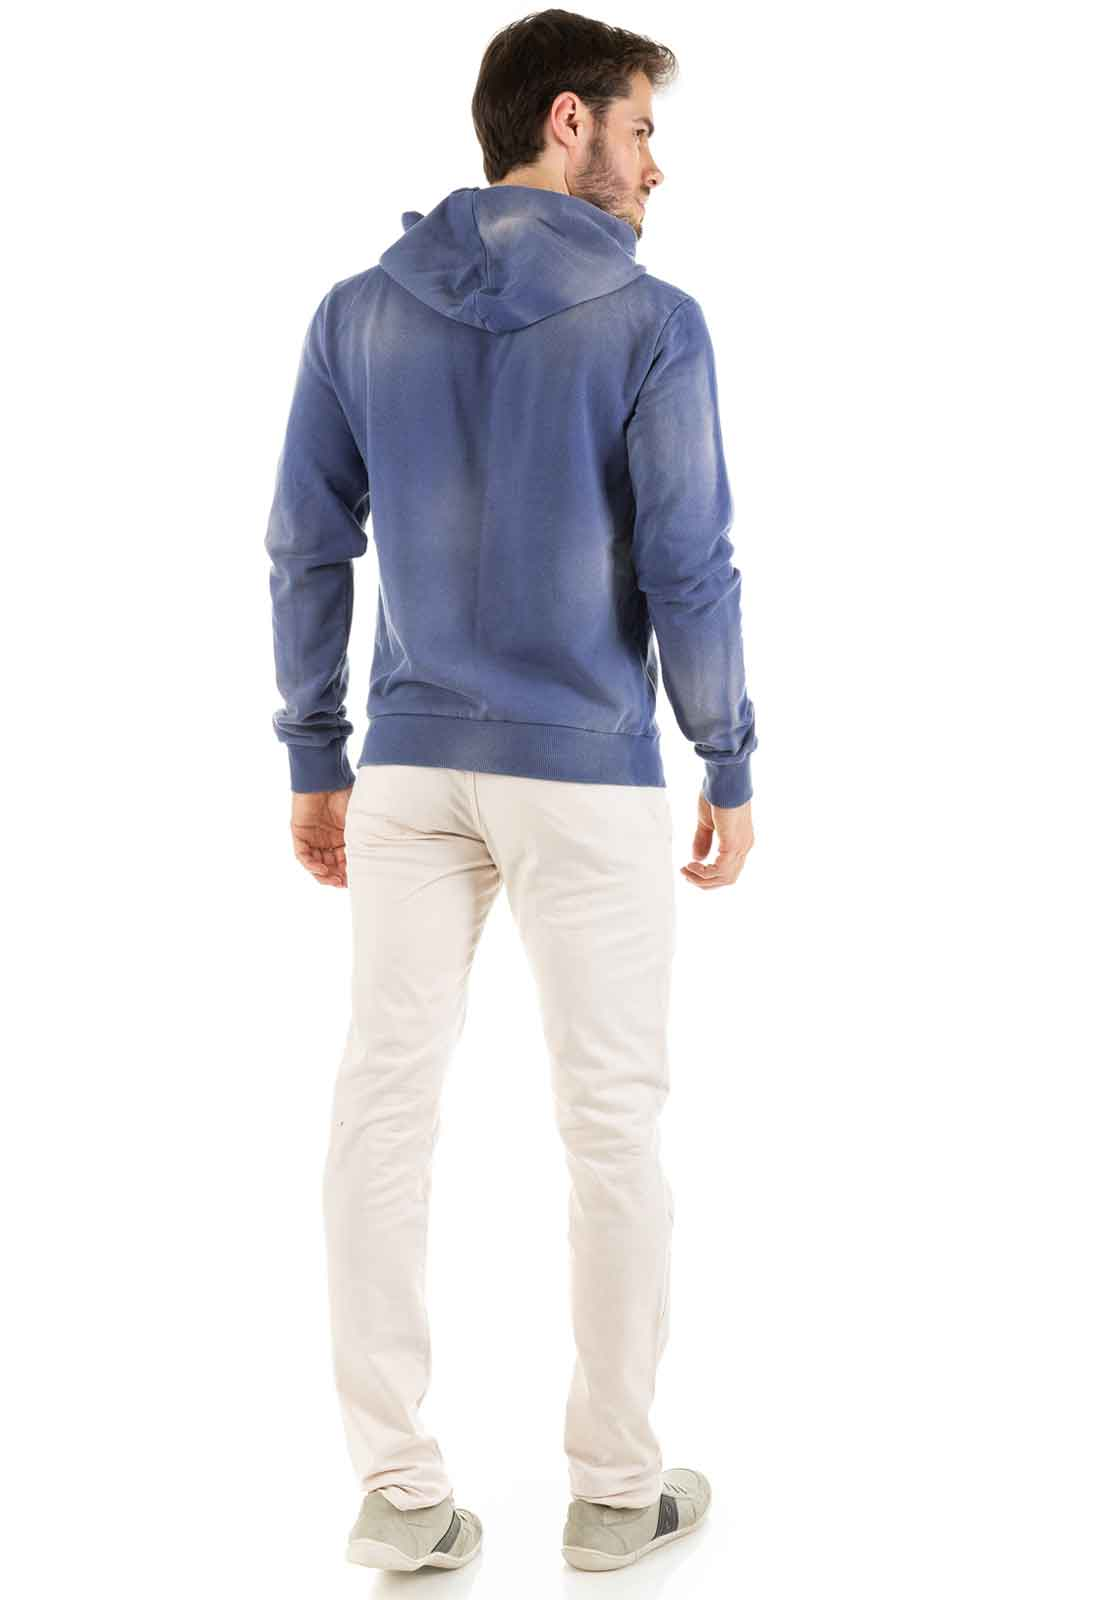 Calça Sarja Dioxes Masculina Cintura Média Alfaiataria com Bolso Frontal Faca e Traseiro Embutido